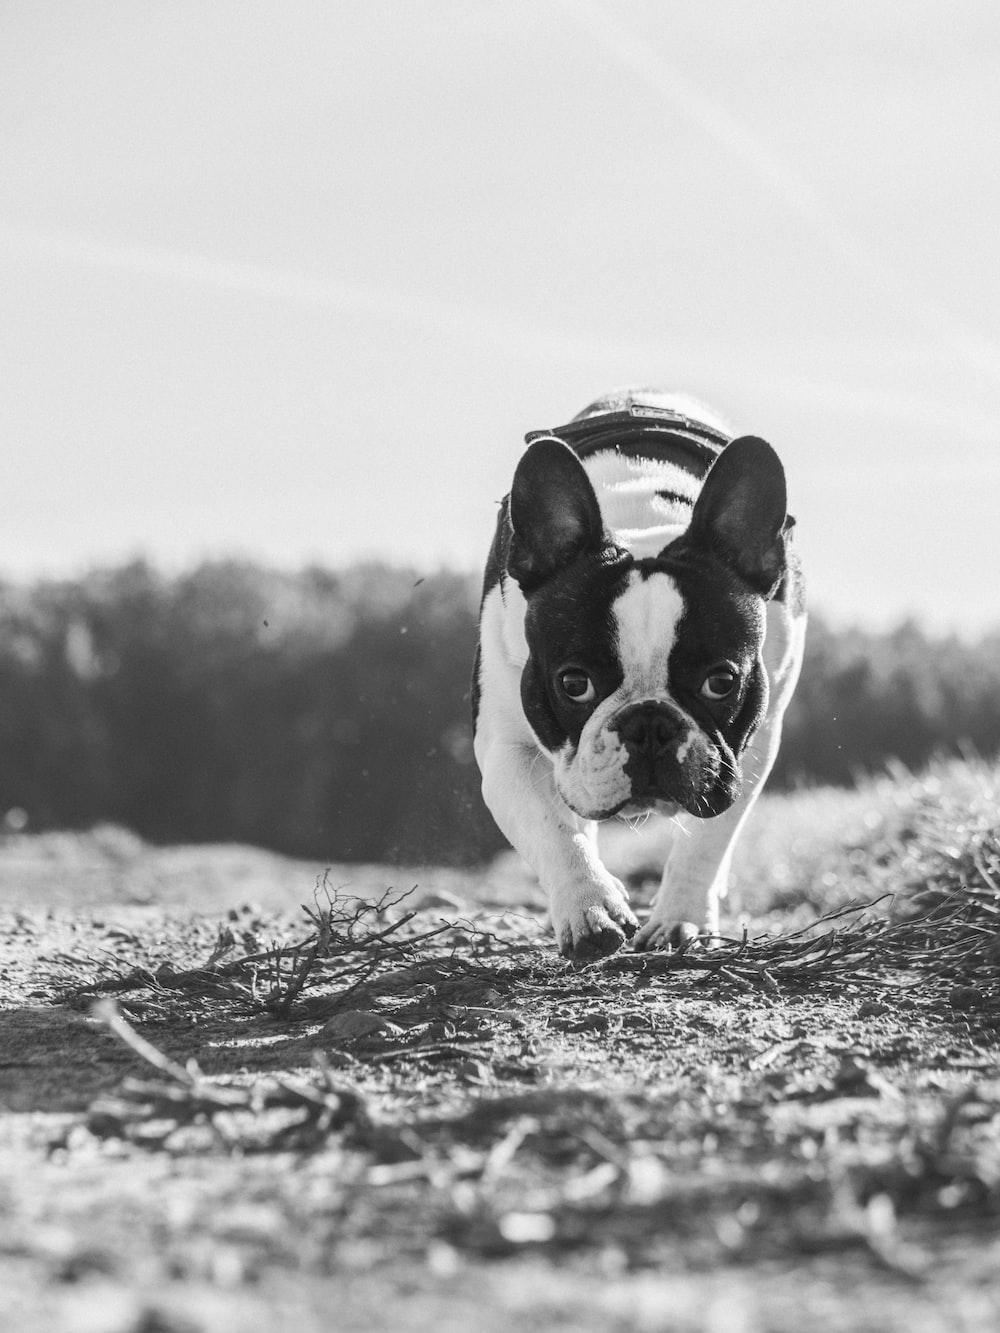 greyscale photography French bulldog